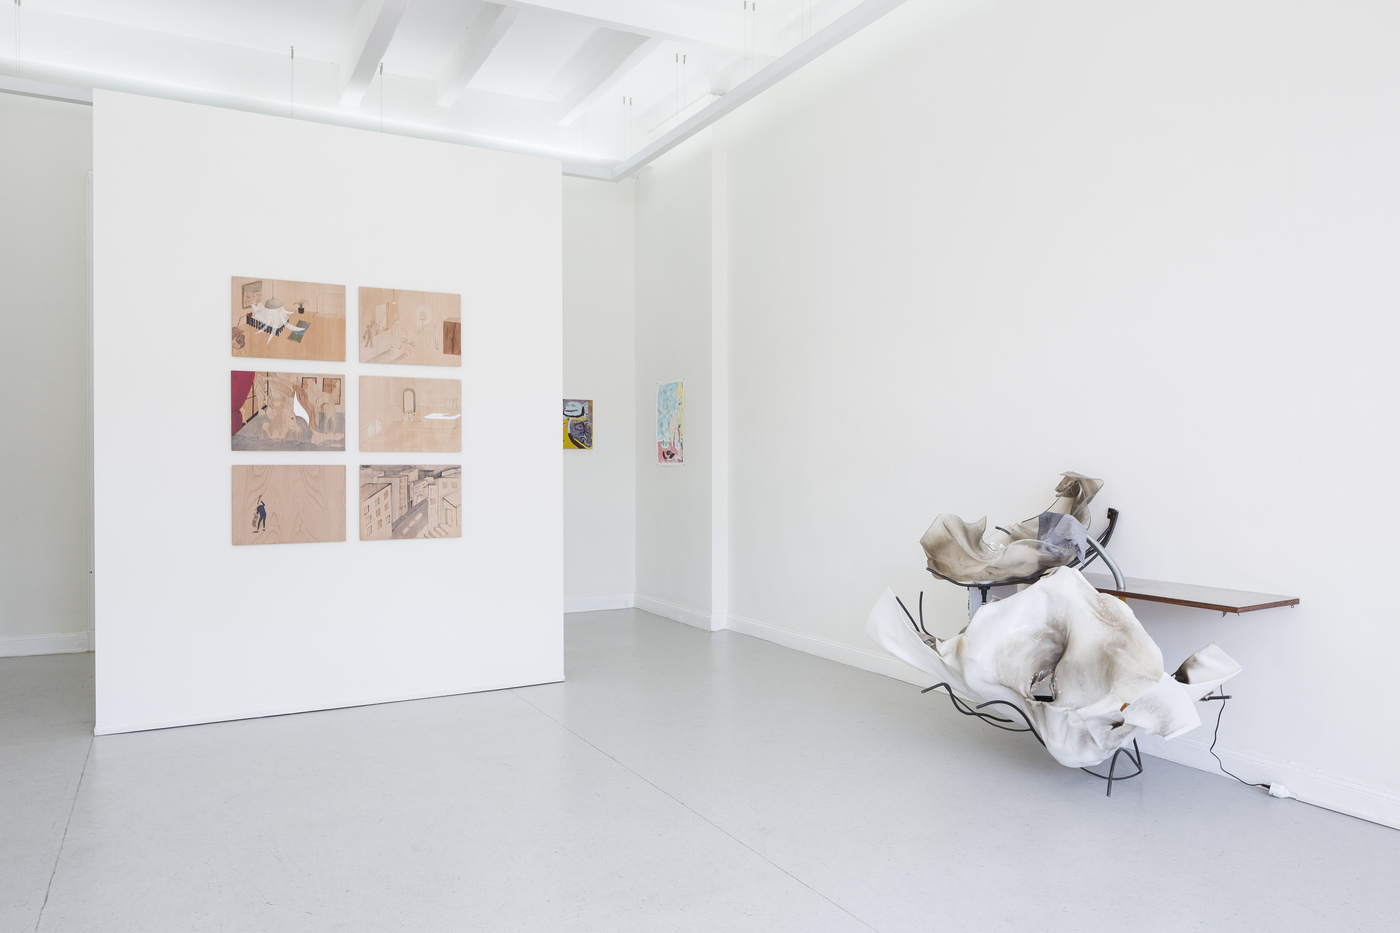 10_Installation_View_ToLieInTheCheeseToSmileInTheButter_KUNSTSAELEBerlin_2016_Frank_Sperling